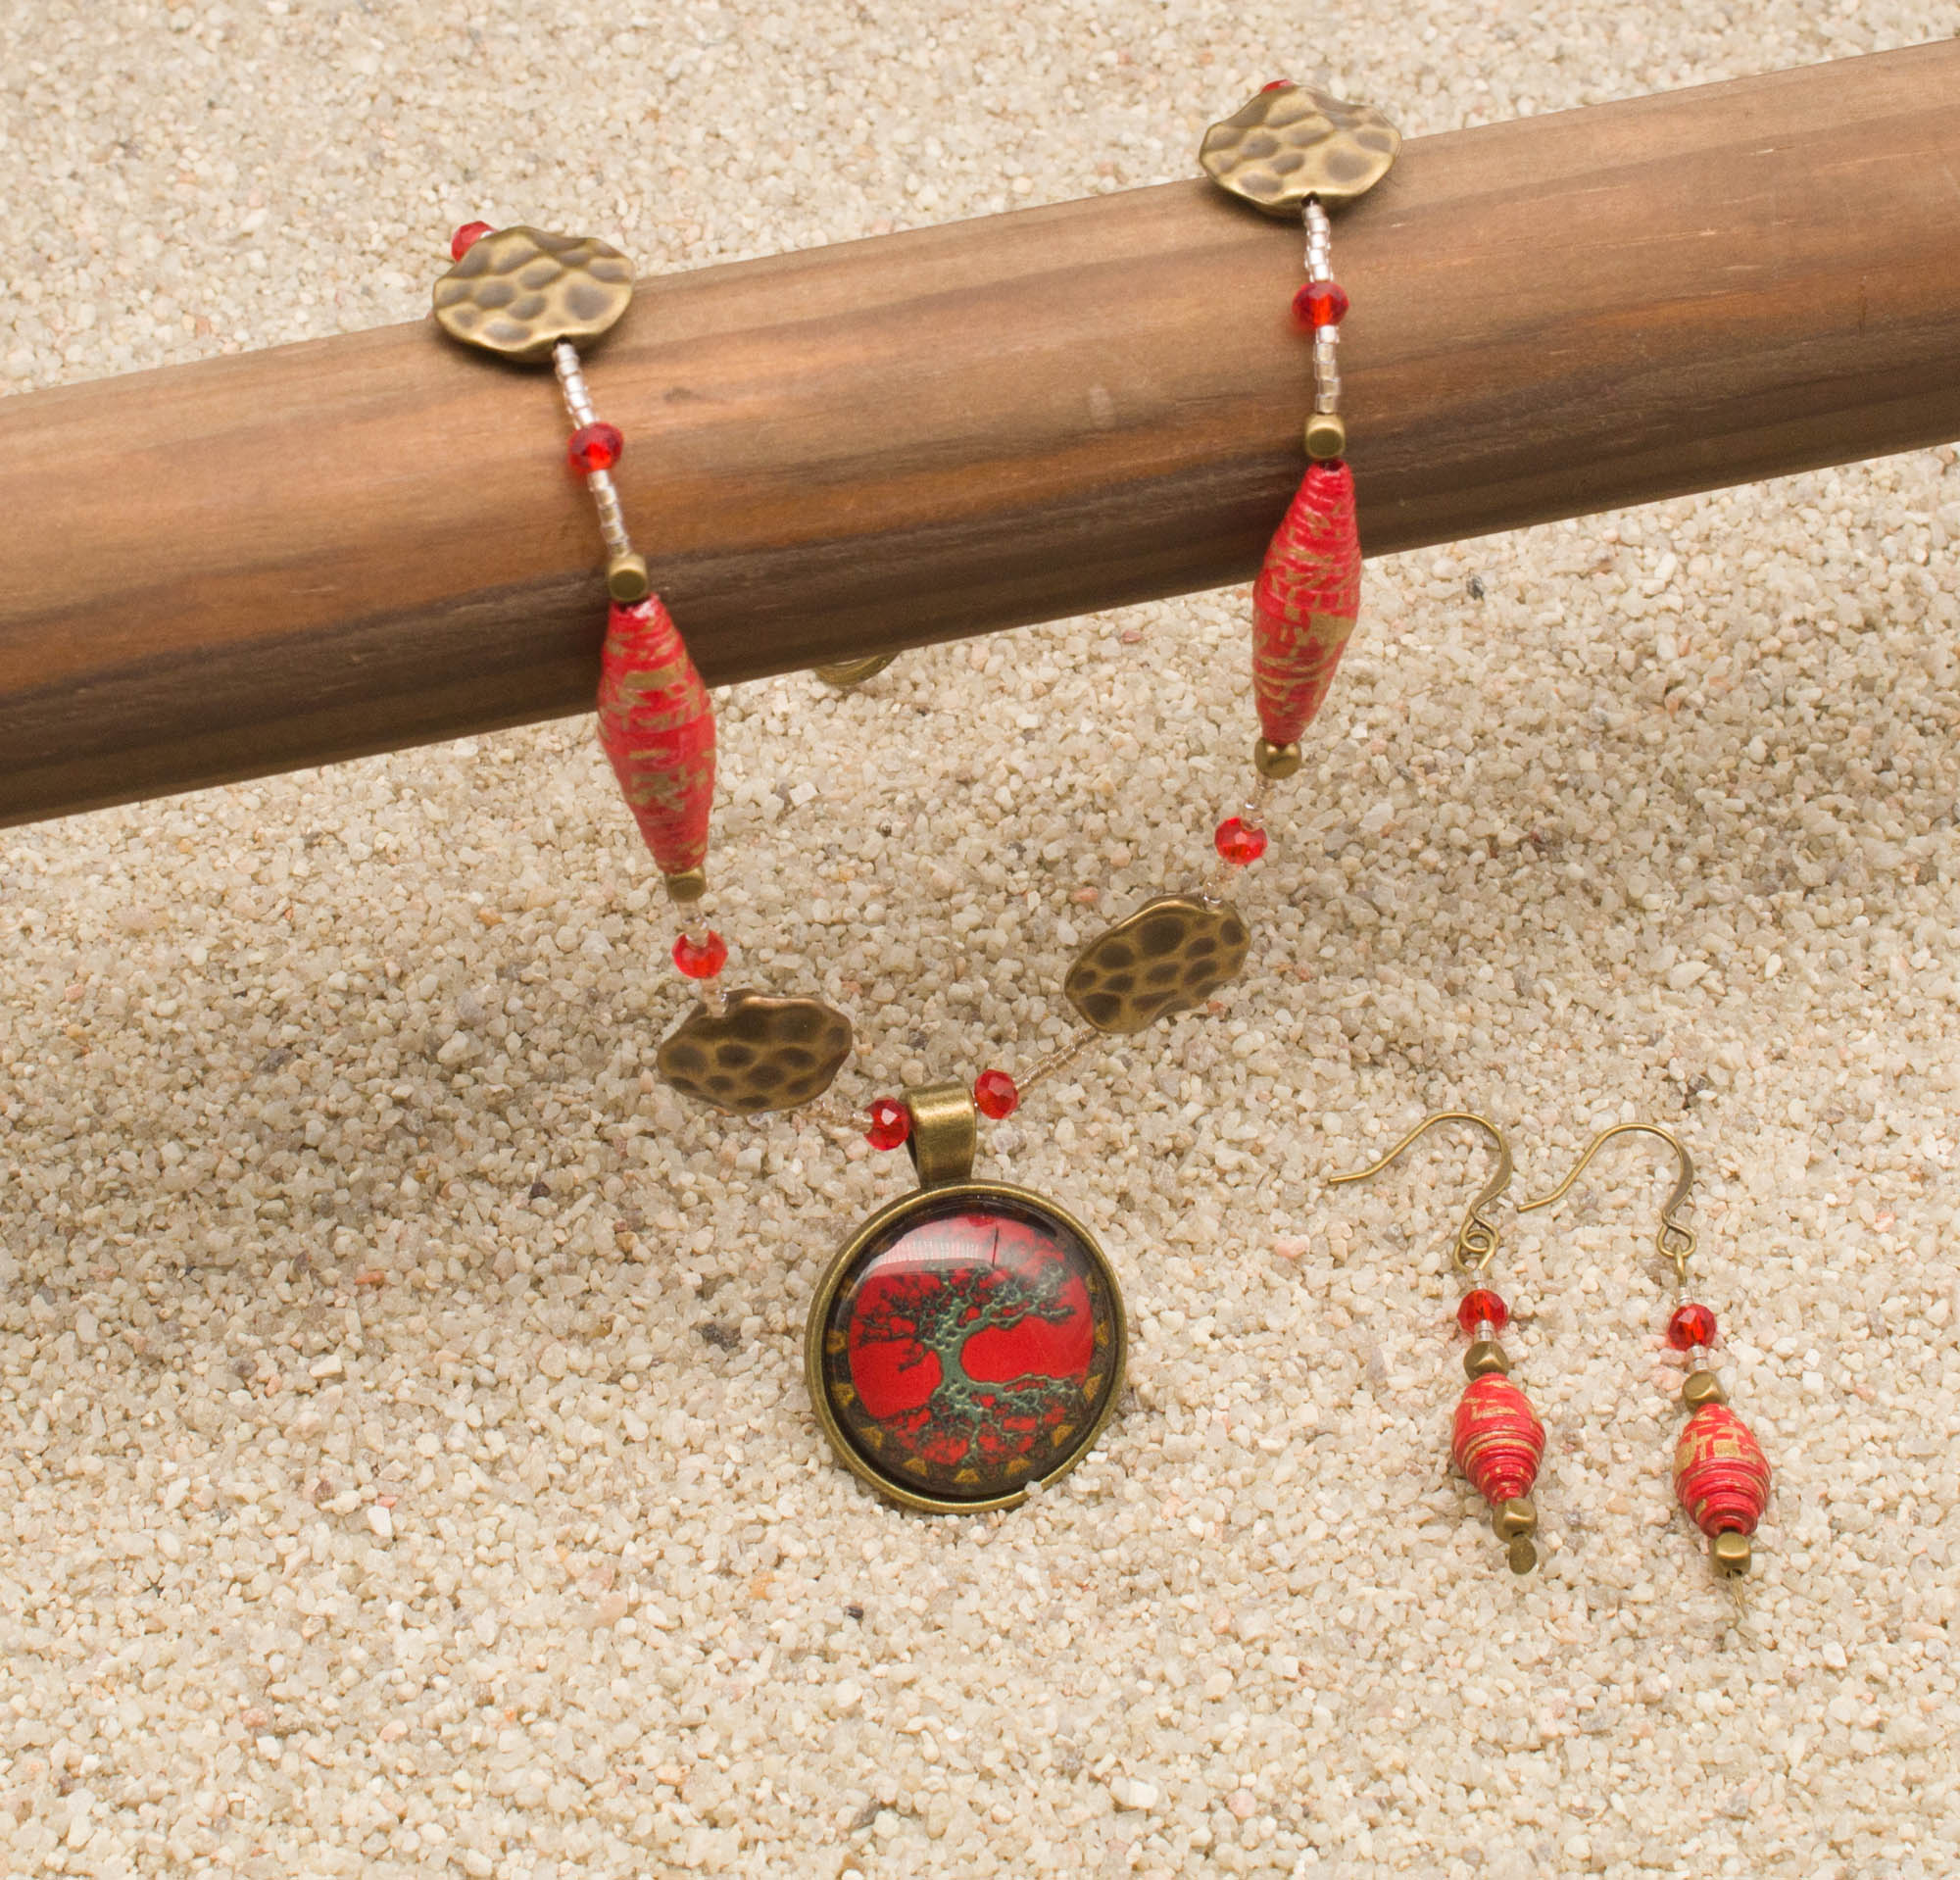 NE813LSb - Geisha Girl Necklace and Earring Set